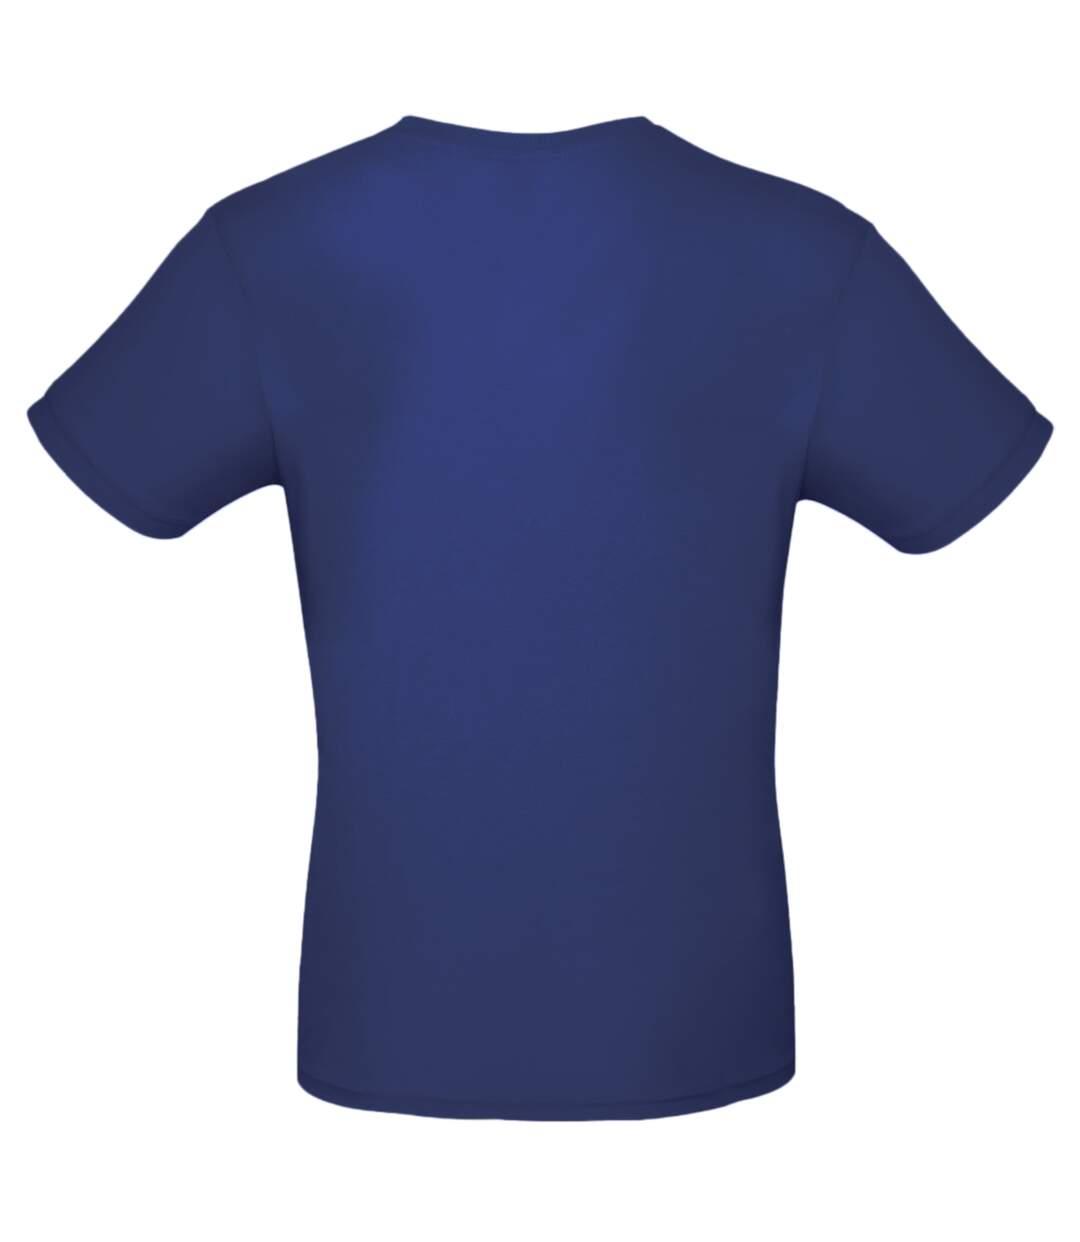 B&C Mens #E150 Tee (Bottle Green) - UTBC3910